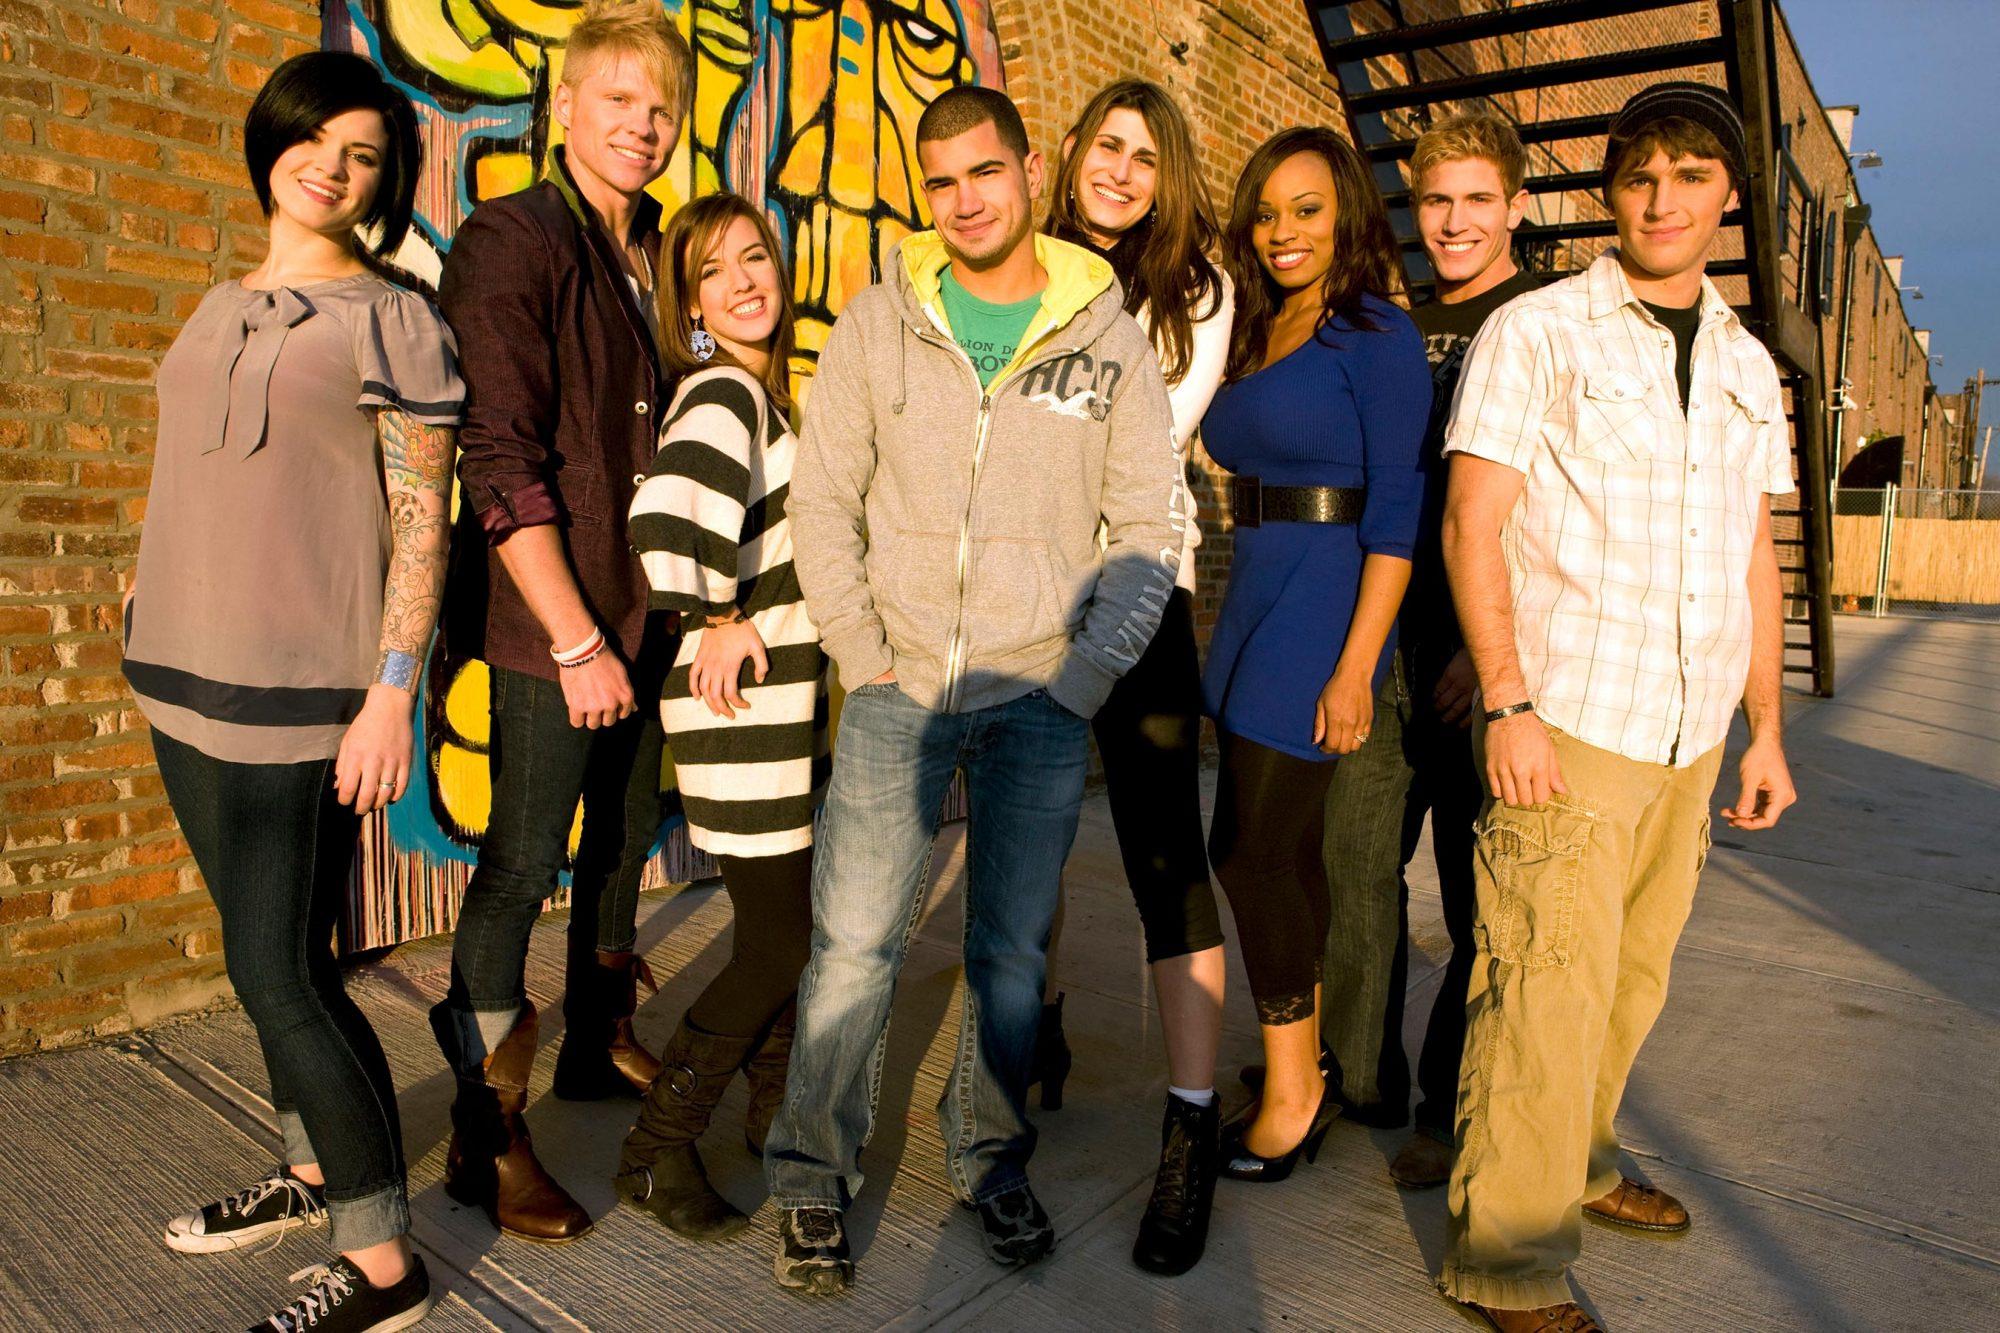 MTV's Real World BrooklynSarah, Chet, Baya, JD, Katelynn, Devyn, Scott, Ryan